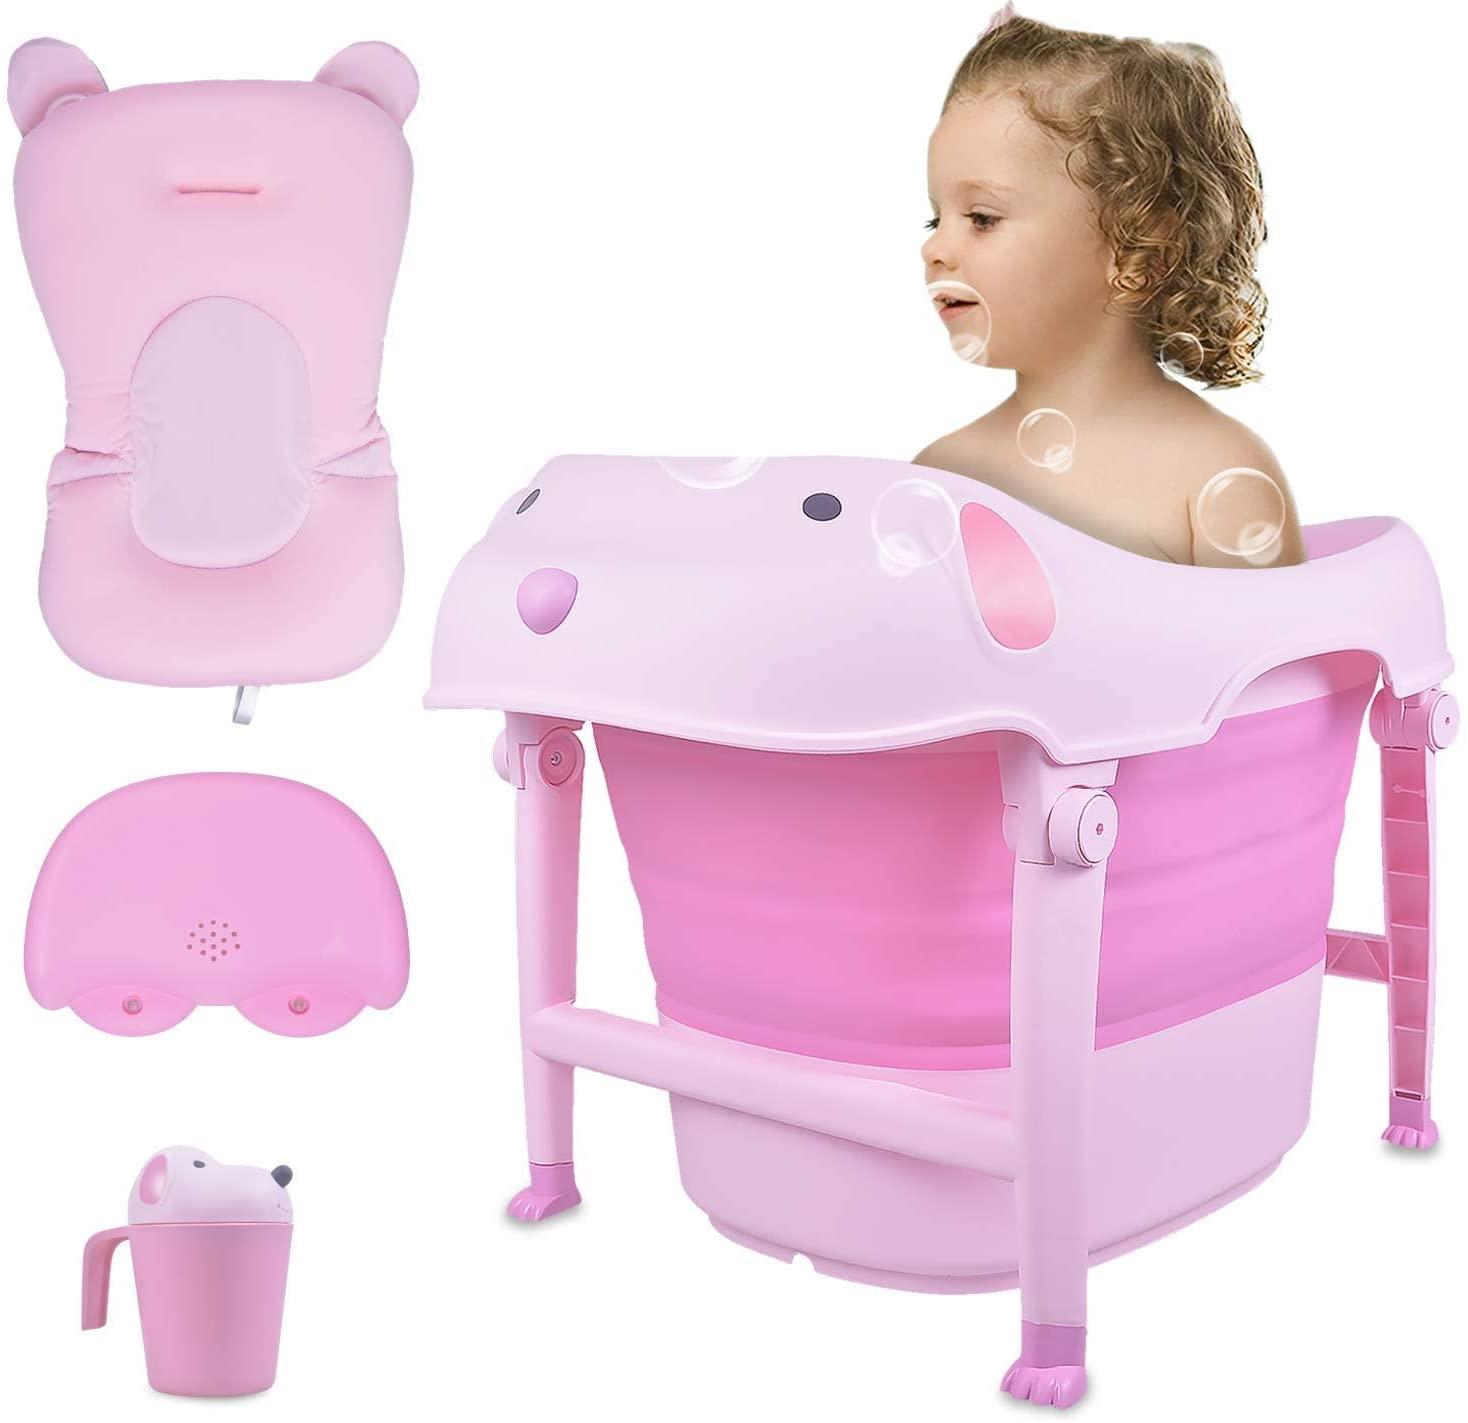 CHENNAO Baby Folding Bathtub, Infant Collapsible Portable Shower Basin